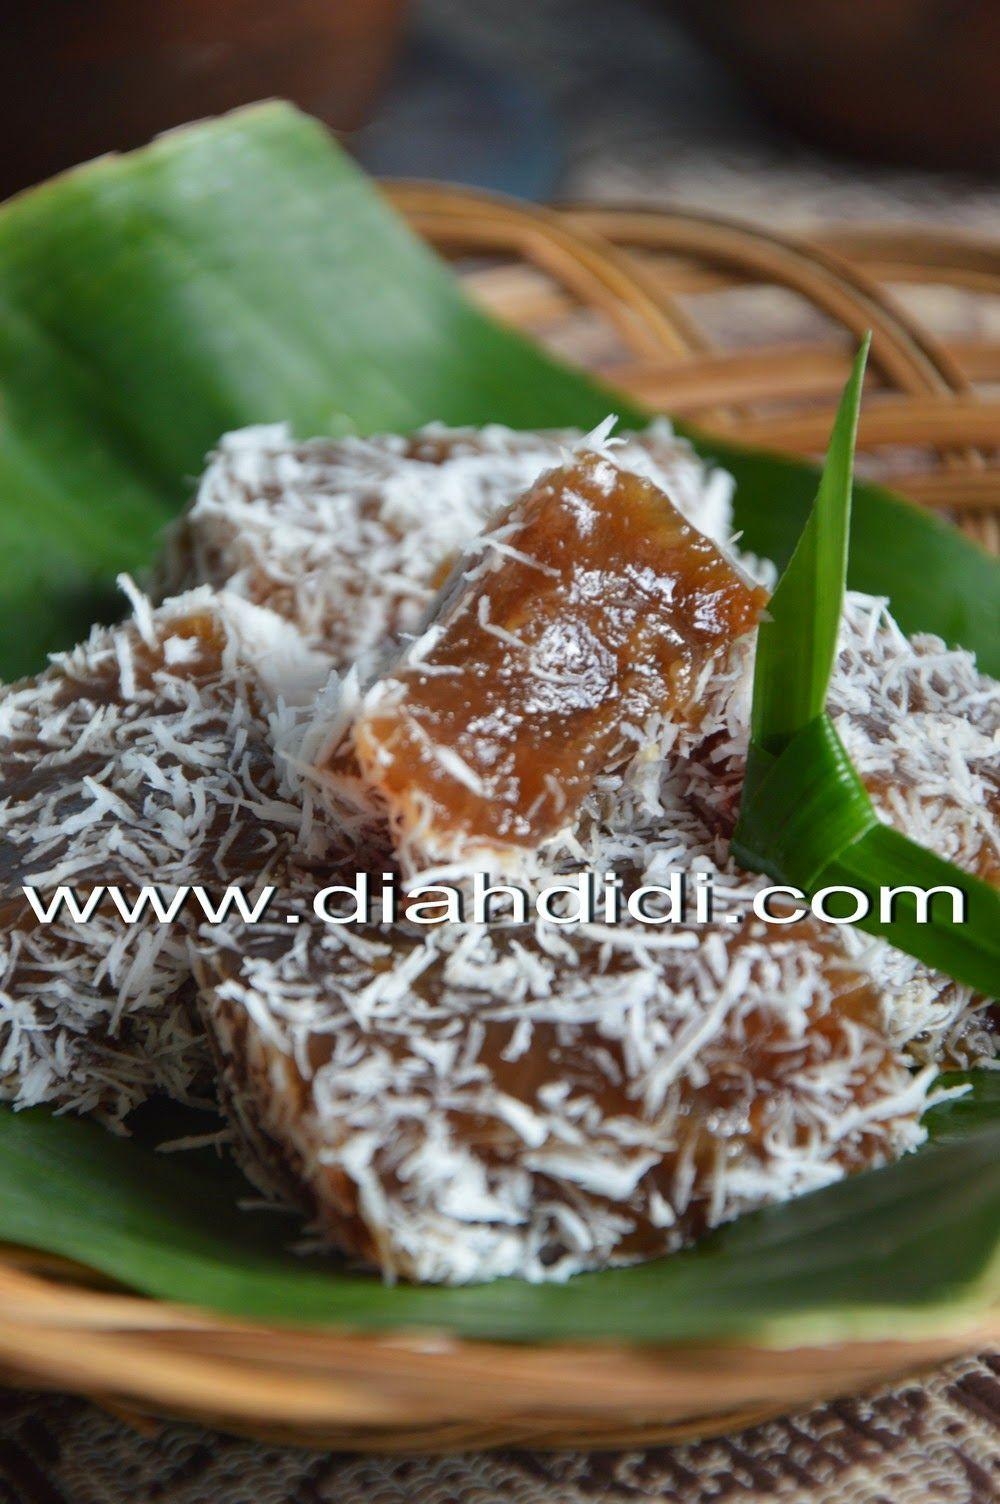 Kue Ongol Ongol Yang Jadul Yang Paling Enak Ternyata Memakai Tepung Garut Resep Masakan Indonesia Makanan Ringan Manis Makanan Dan Minuman